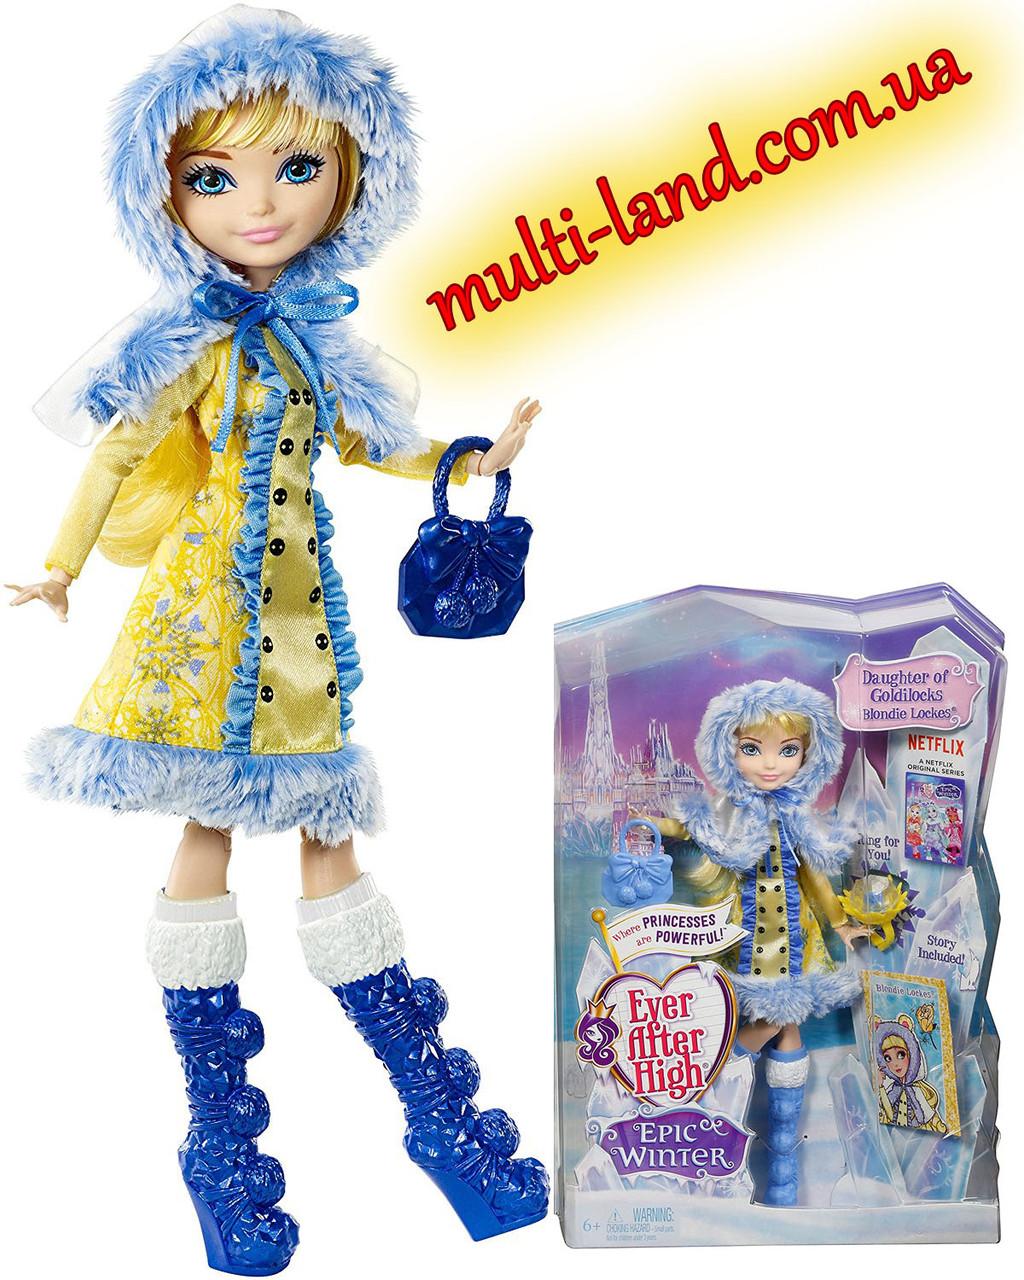 Ever After High Epic Winter Blondie Lockes Doll Кукла Эвер Афтер Хай Блонди Локс Эпическая Зима